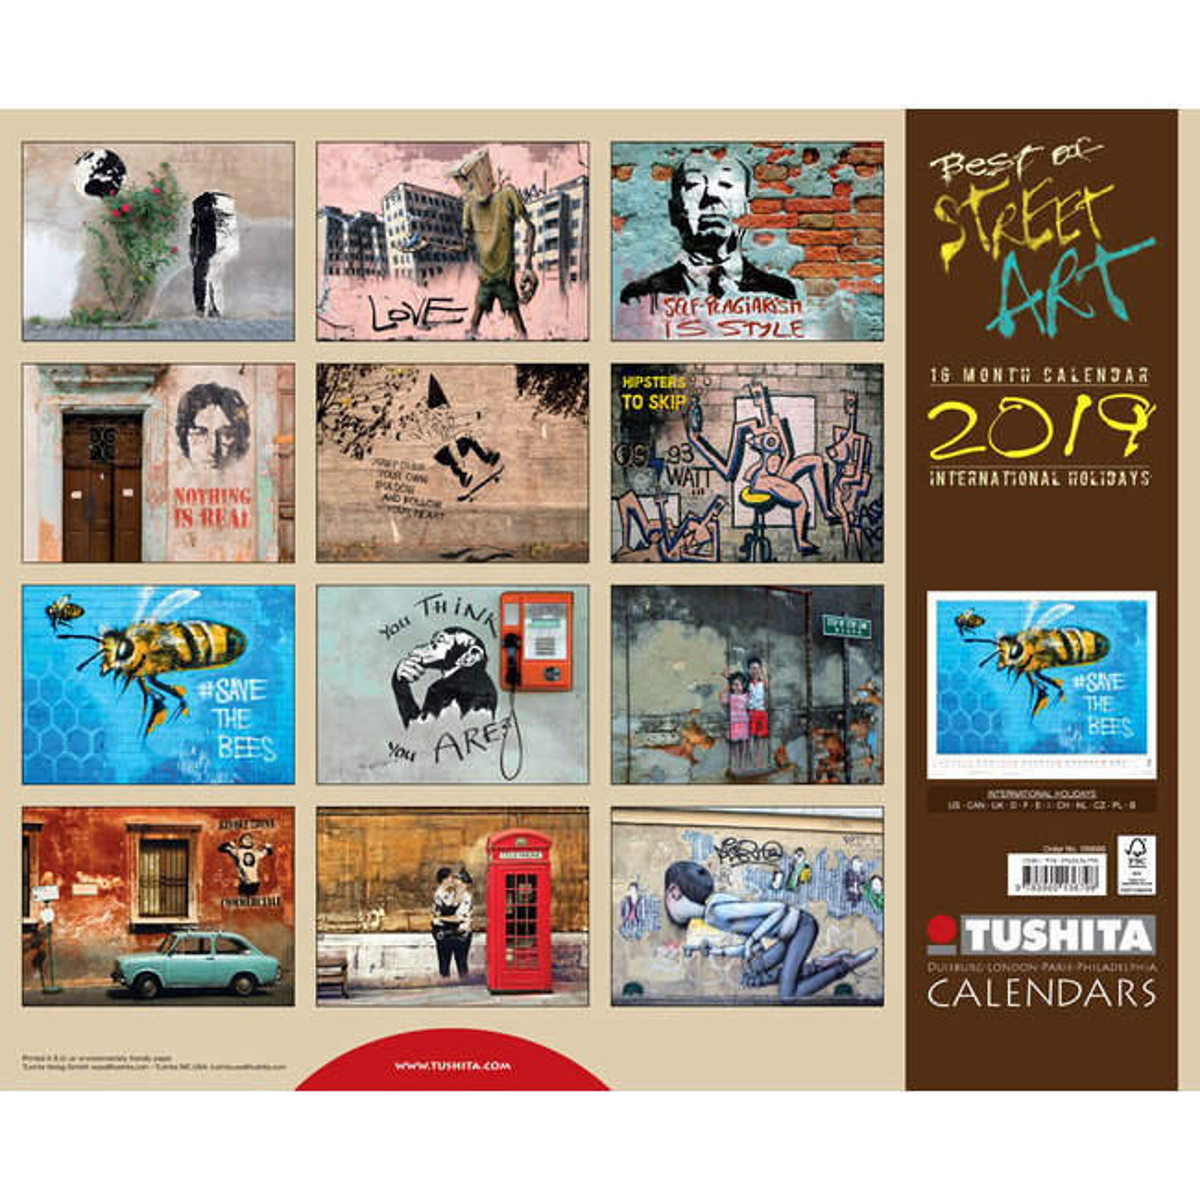 Grand Calendrier Mural 2019.Maxi Calendrier 2019 Street Art Art Urbain Maxi Grand Format